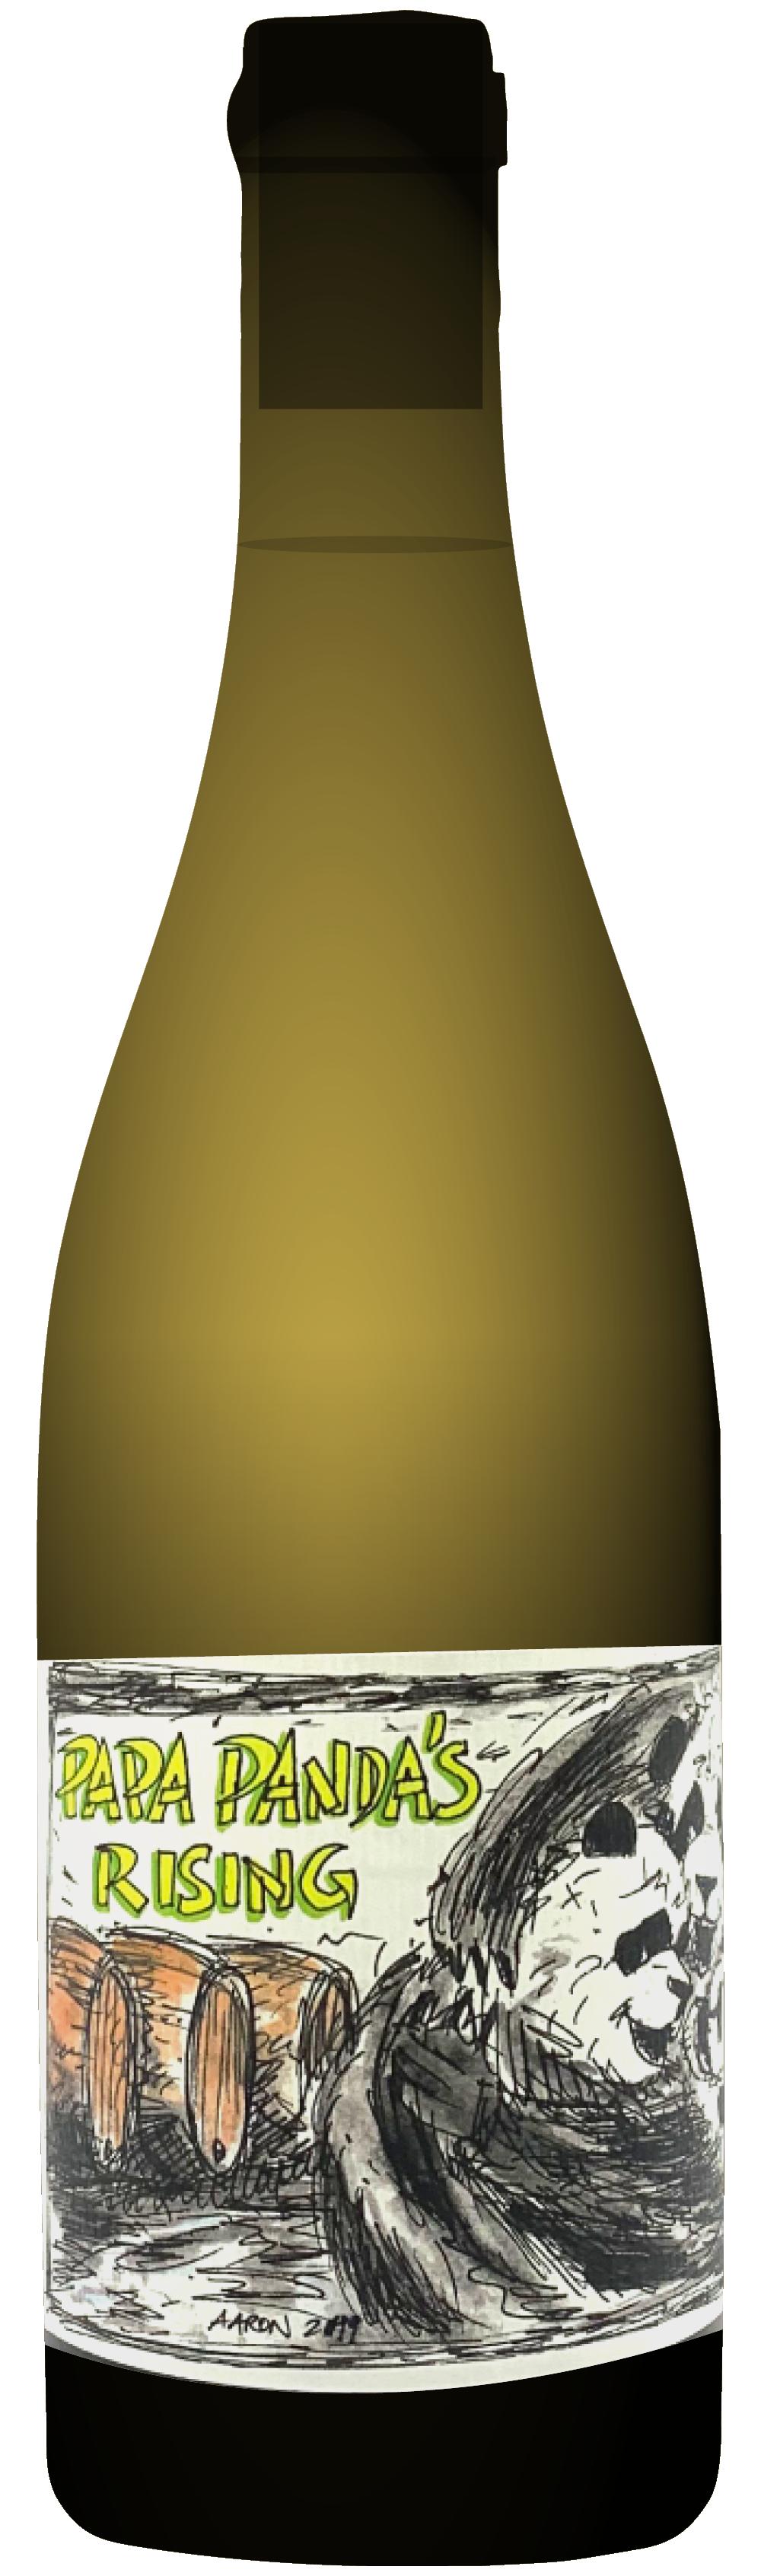 the natural wine company club december 2020 germany staffelter hof papa panda rising 3